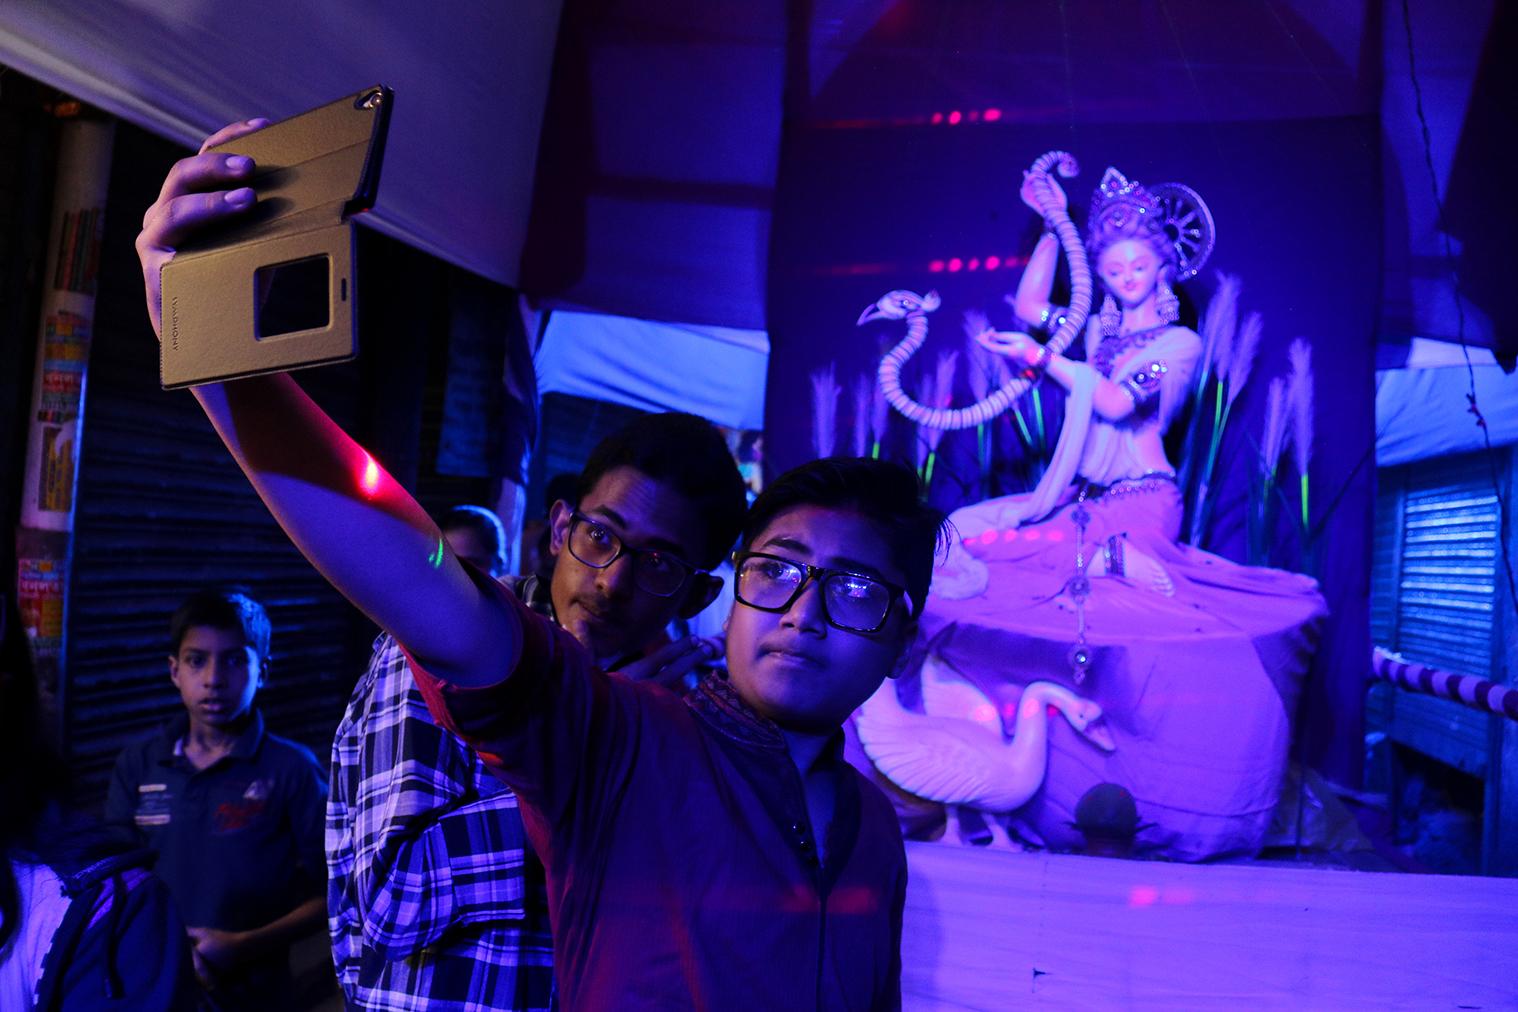 Kto by nechcel selfie so Saraswati Puja?